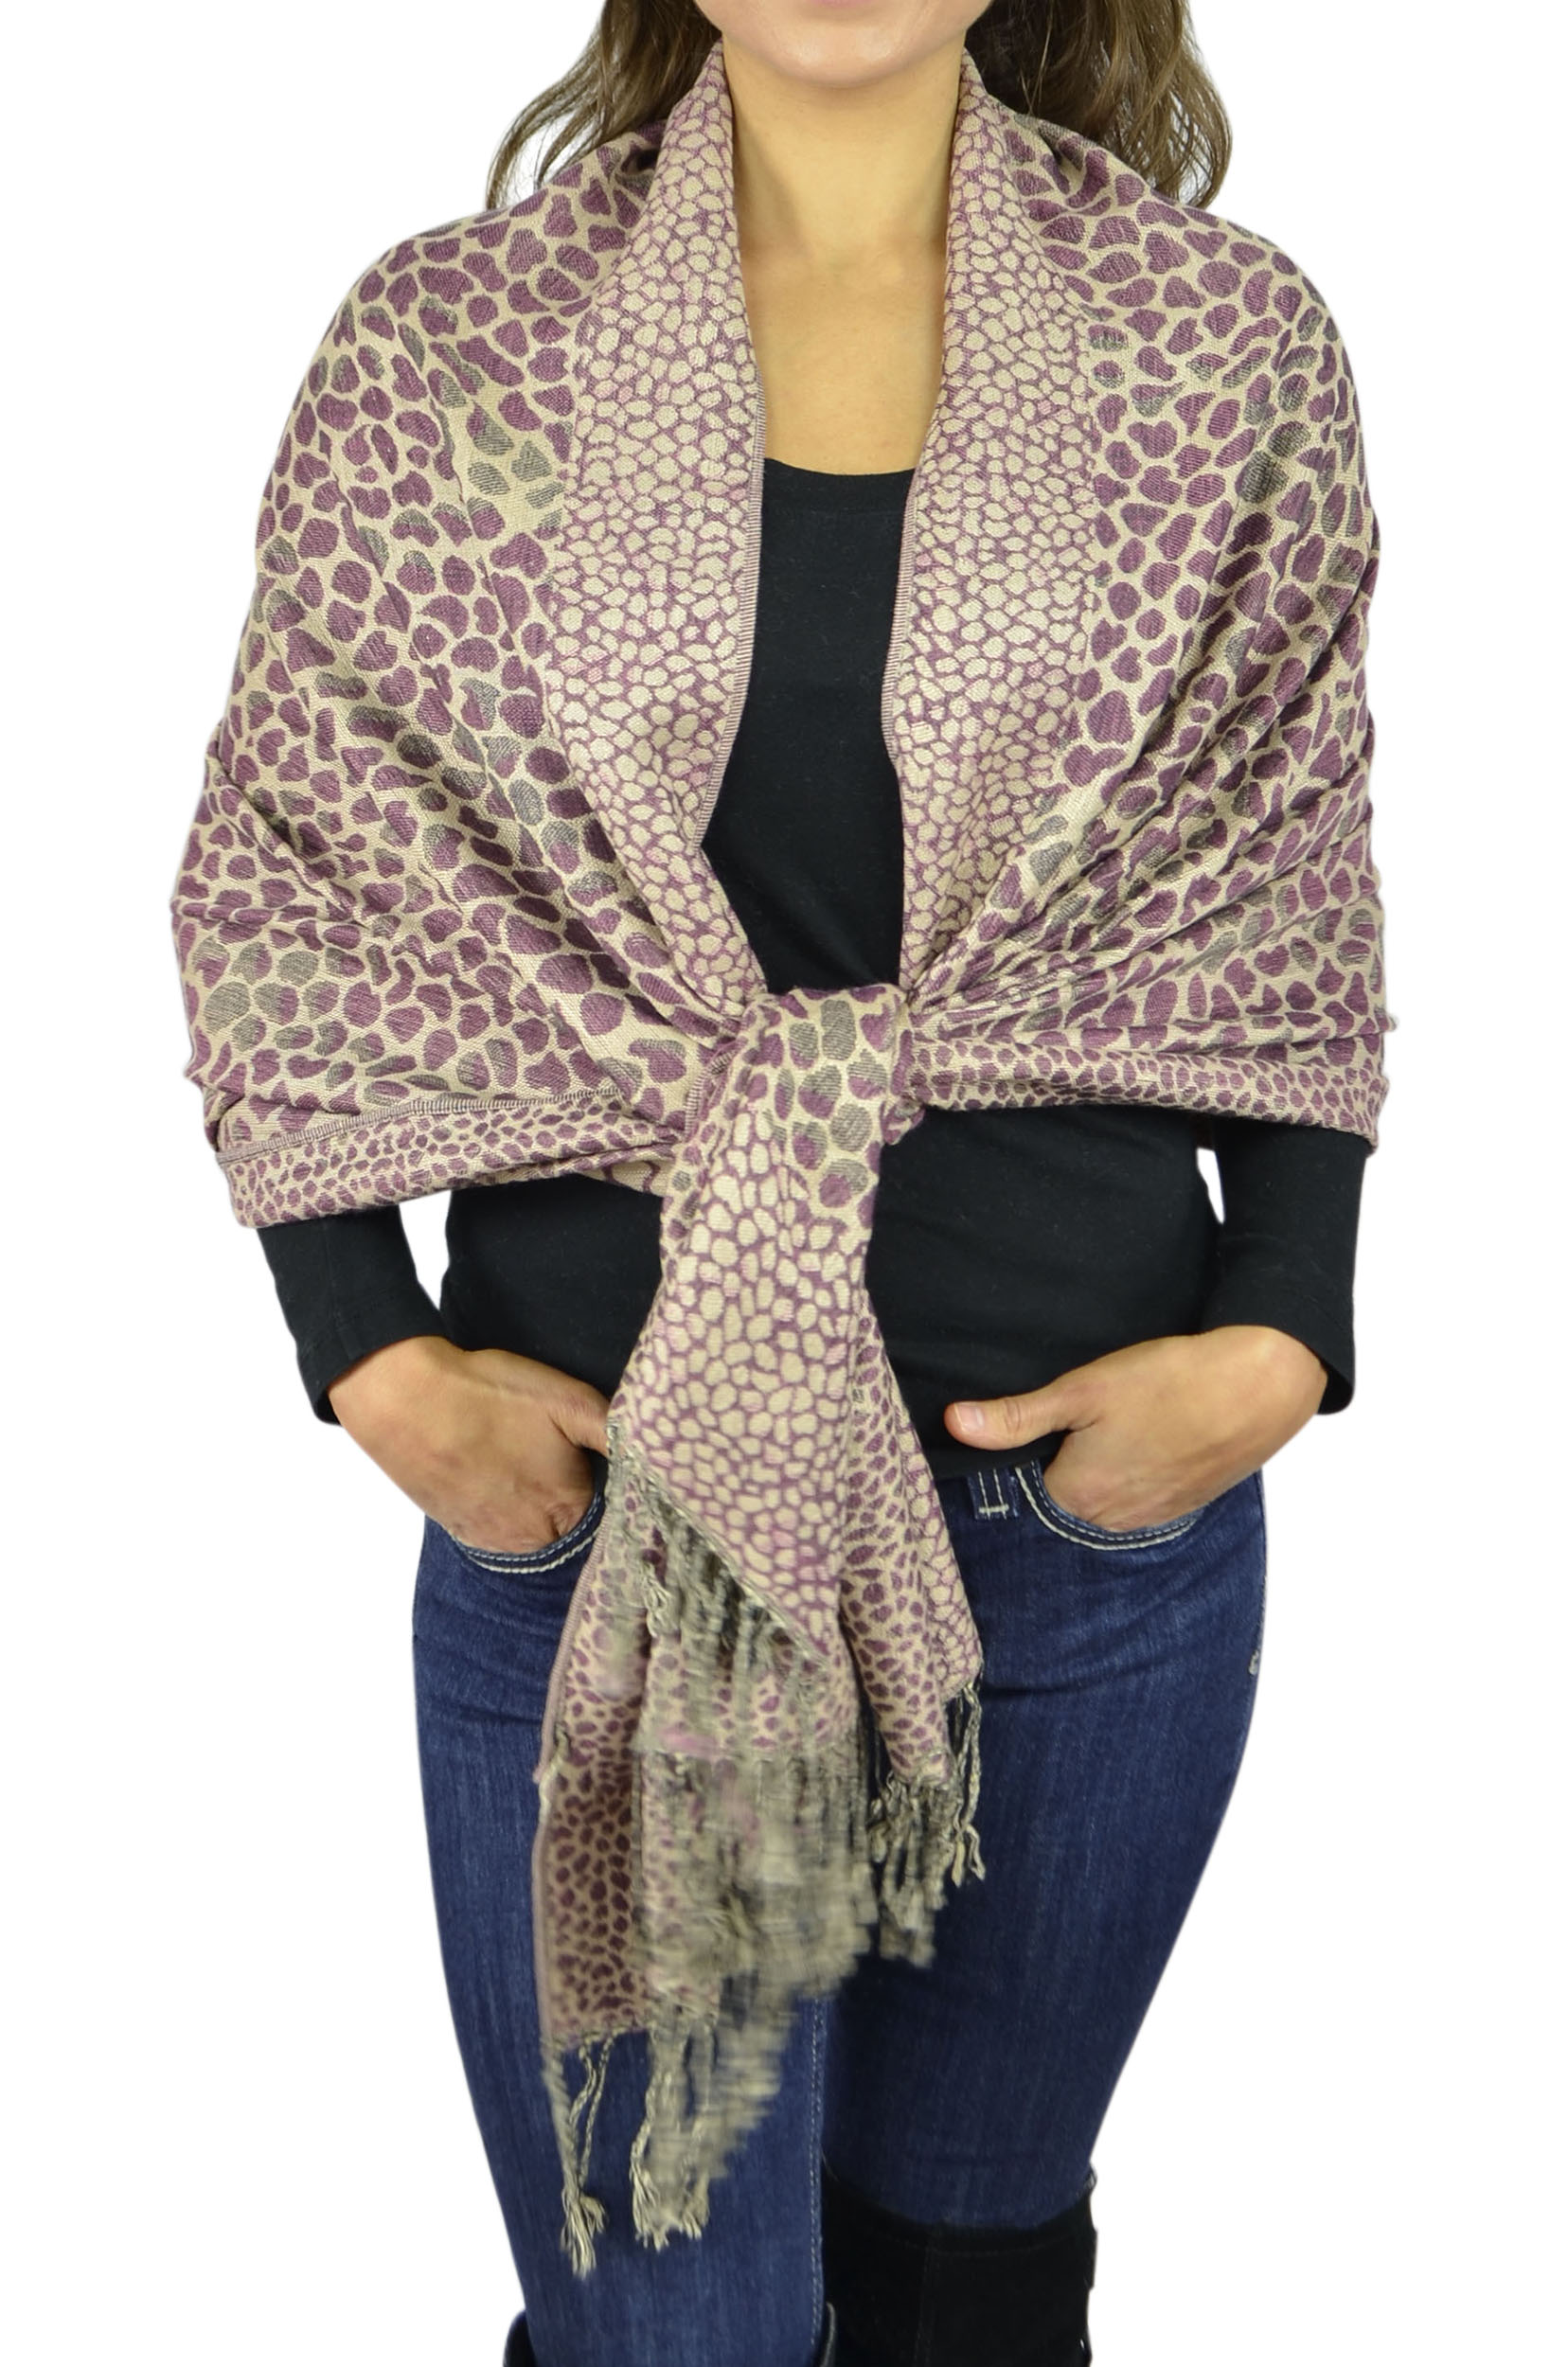 Pashmina Women Soft Wrap Shawl Animal Print Scarf By Belle Donne - Wine